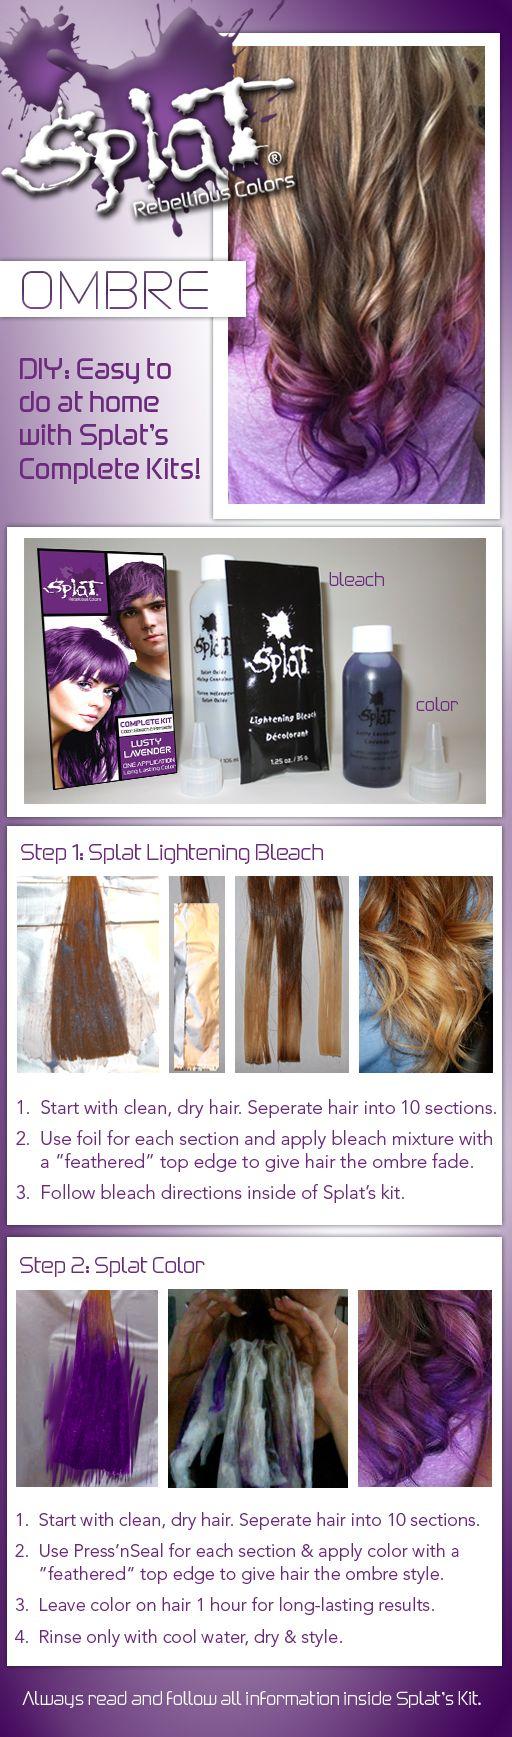 32cddc52e4809e79a385d56cf1509342 Jpg 512 1 737 Pixels Splat Hair Dye Dyed Hair Splat Hair Color